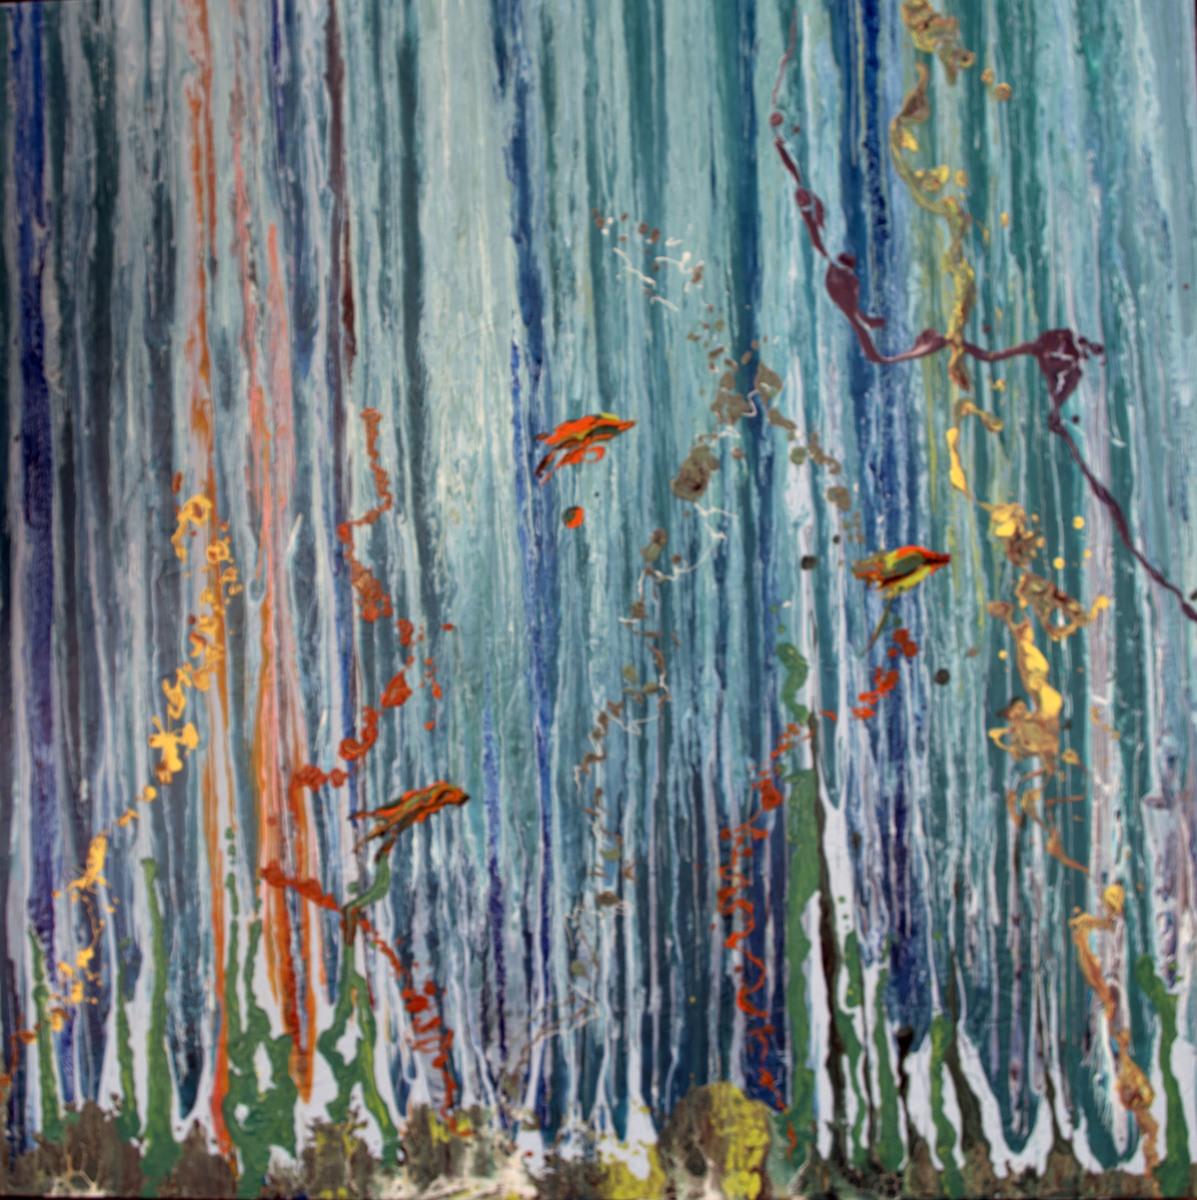 Underwater World (large view)